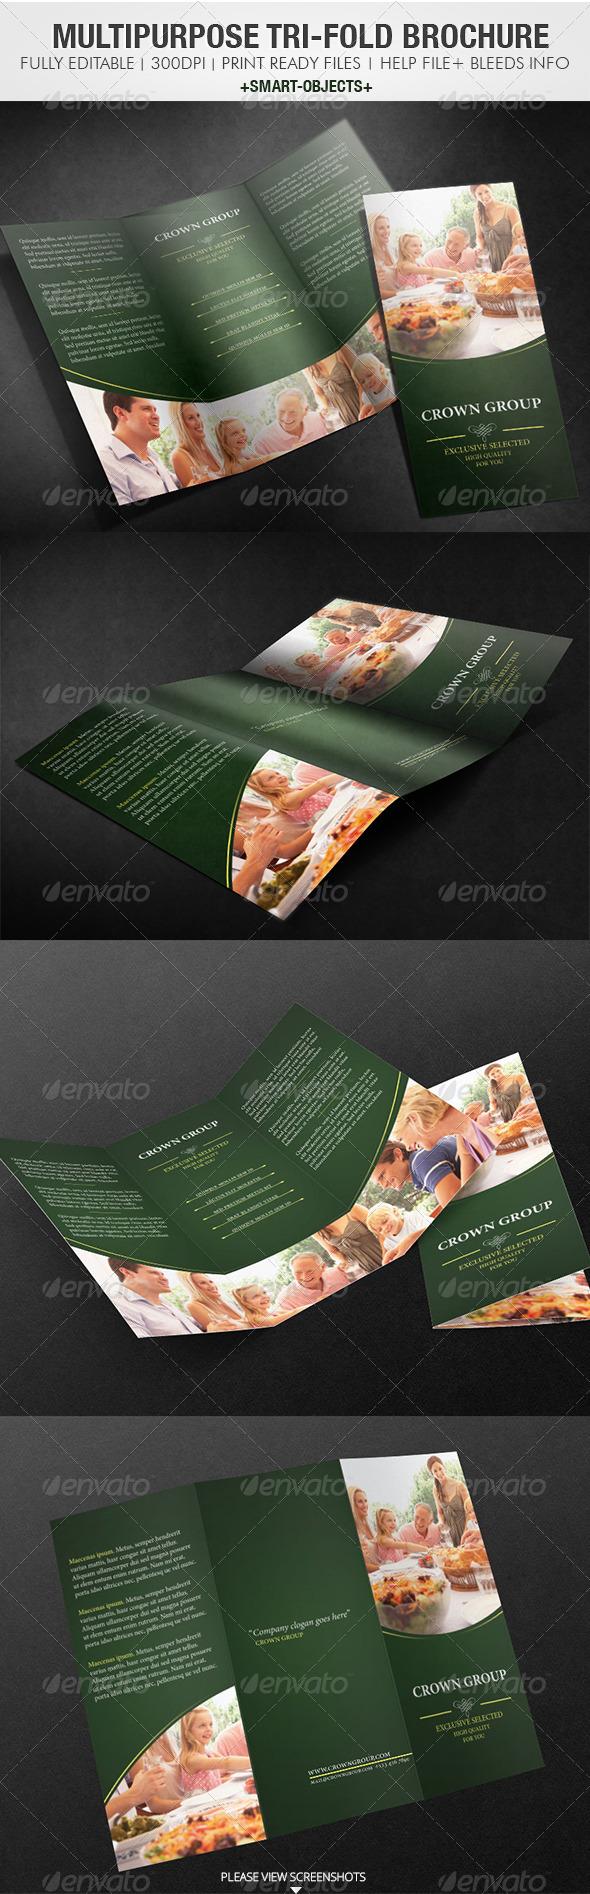 Multipurpose Tri-Fold Brochure - Informational Brochures